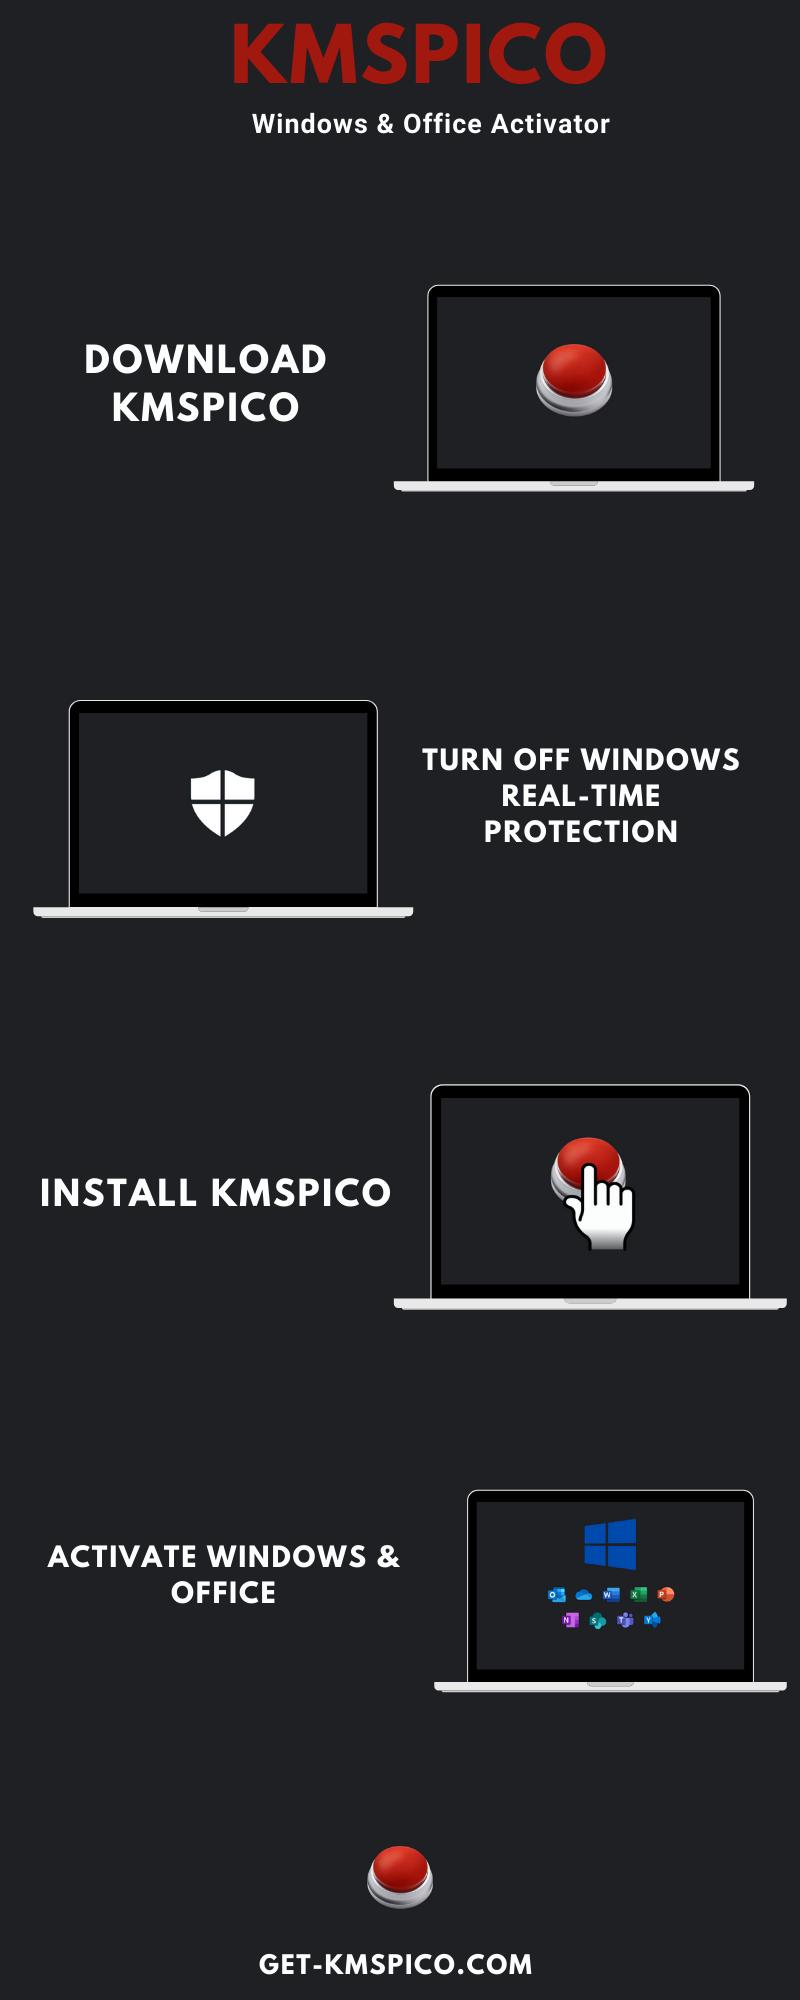 KMSPico-Activator-Infographic